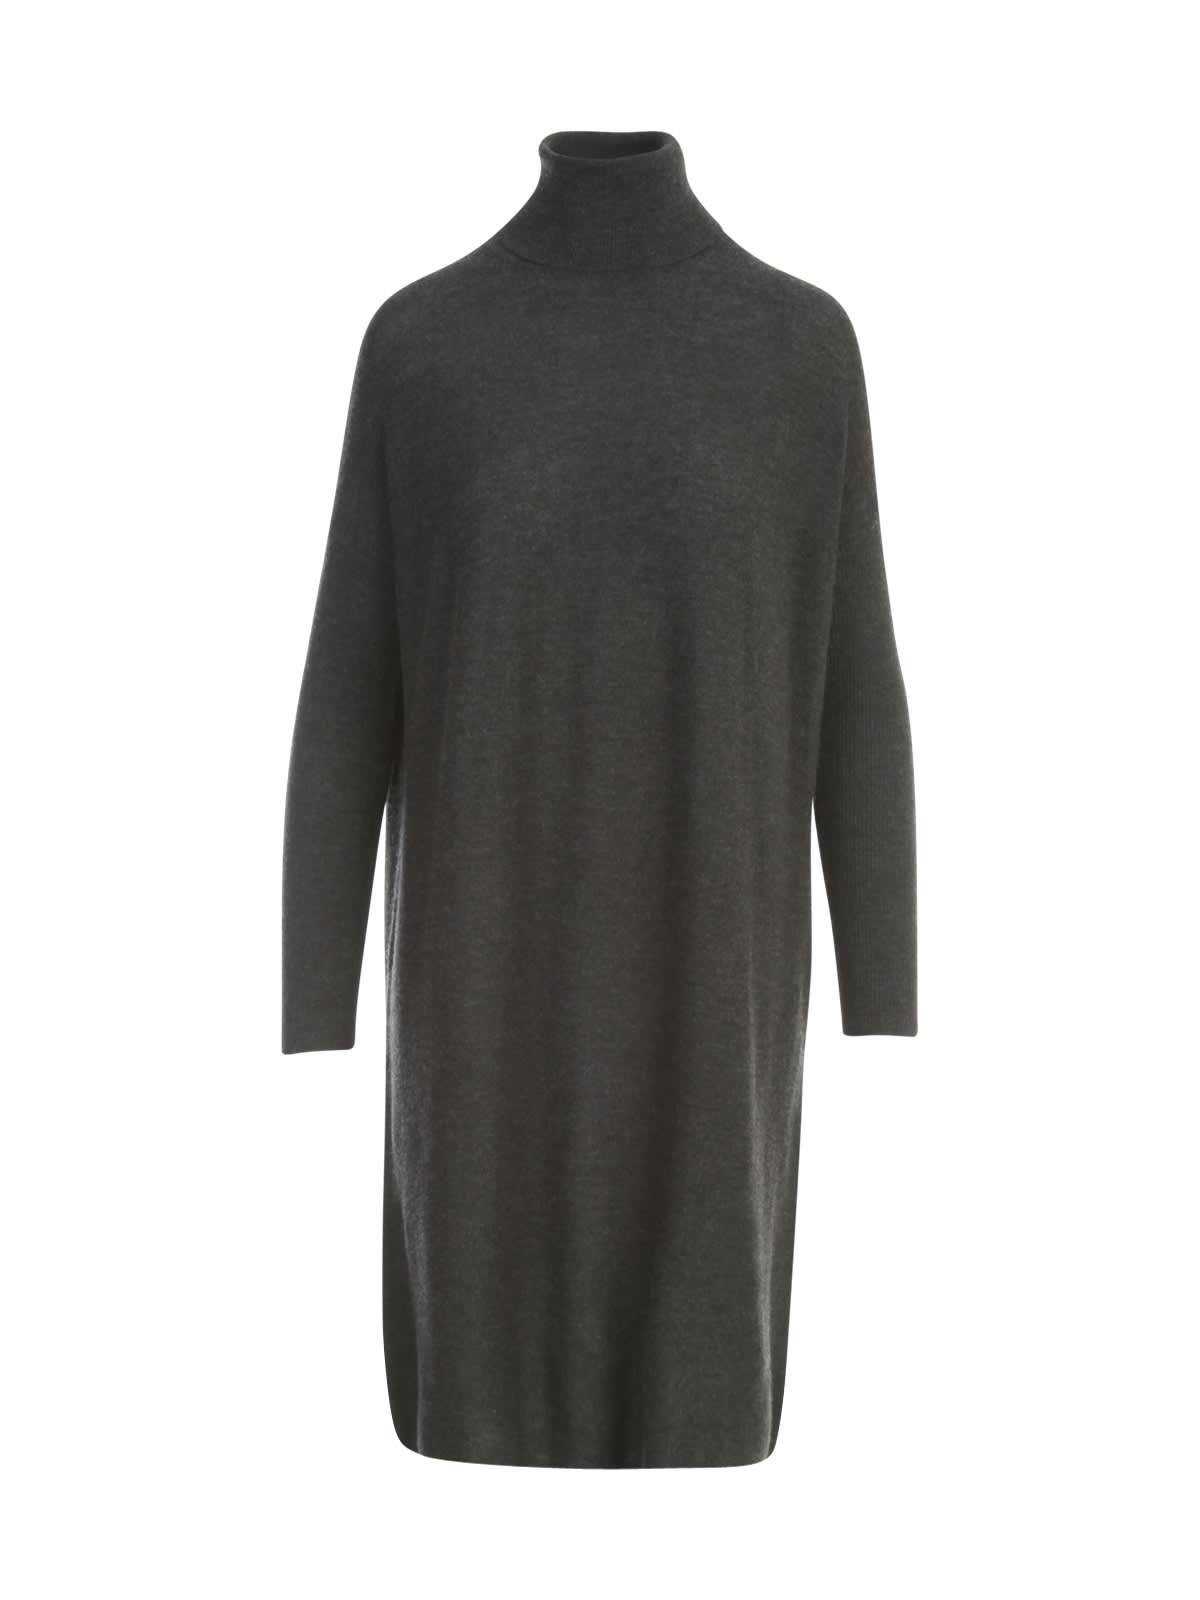 Straight Turtle Neck L/s Dress